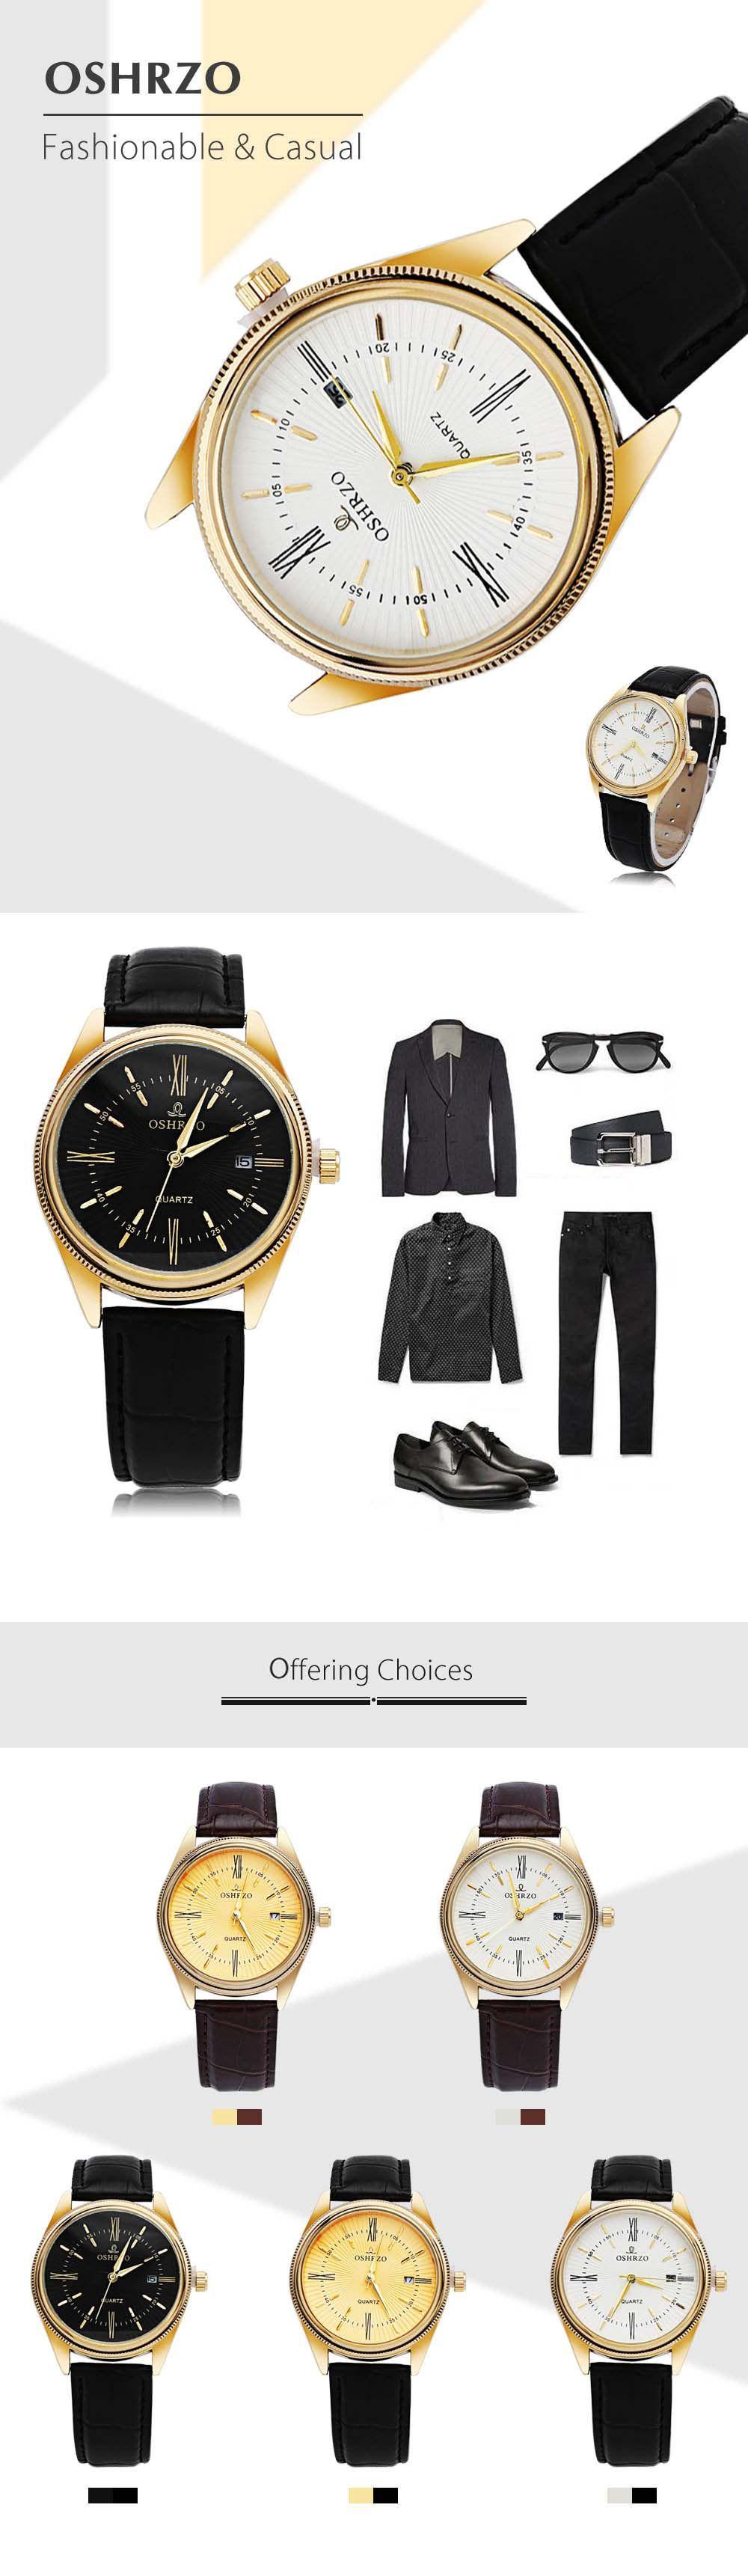 OSHRZO Men Quartz Watch Date Display Water Resistance Leather Band Wristwatch